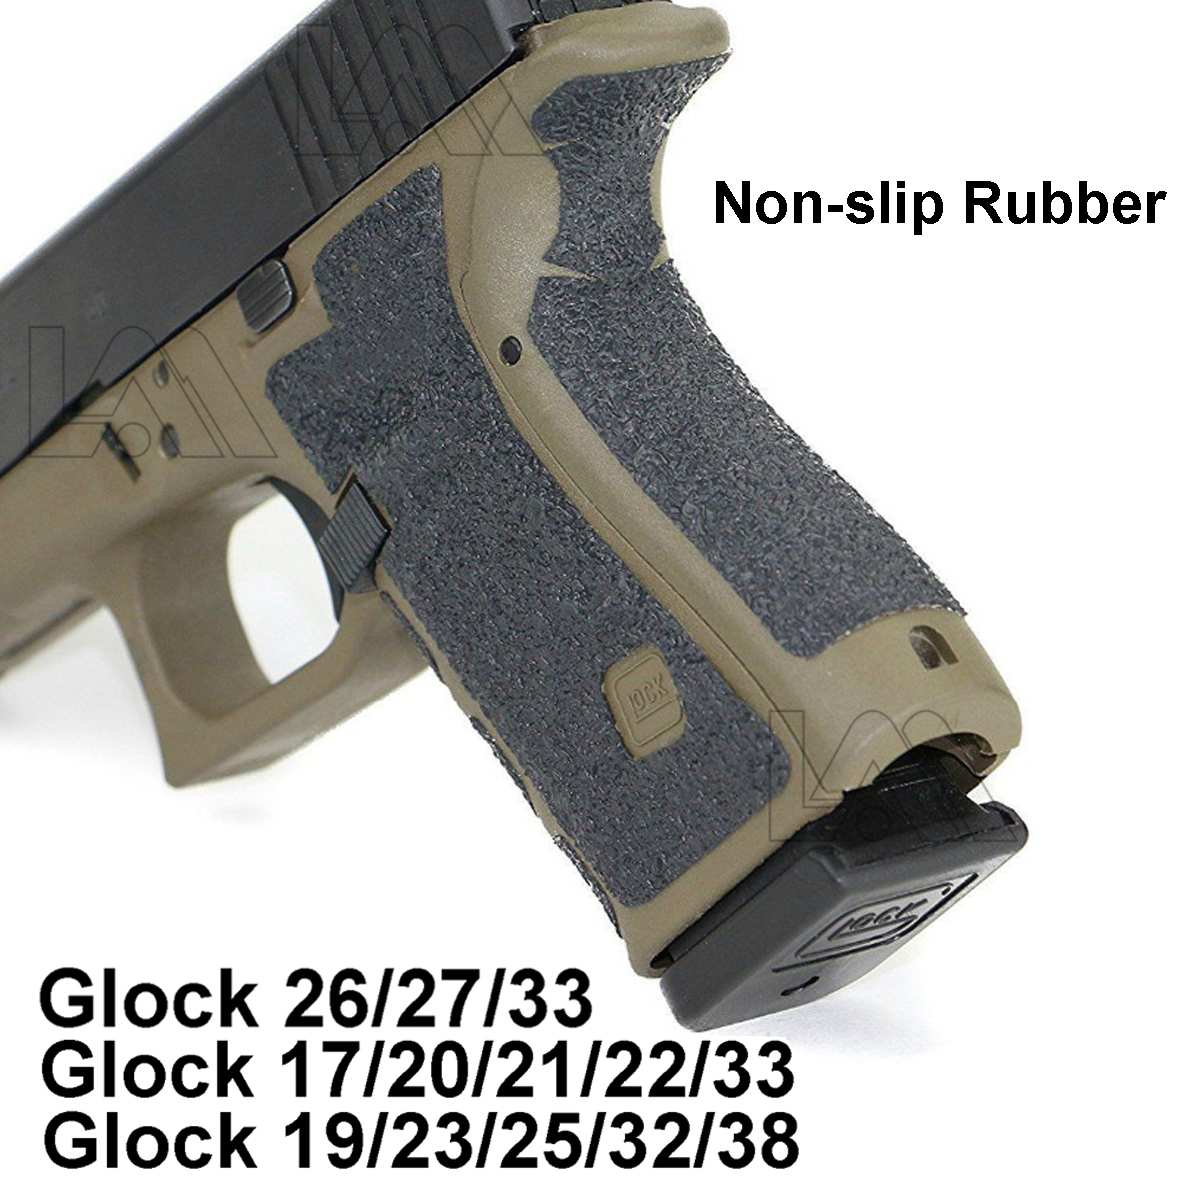 Tactical Non-slip Rubber Texture Grip Wrap Tape Glove For Glock 17 19 20 21 22 25 26 27 33 43 Pistol Gun Magazine Accessories